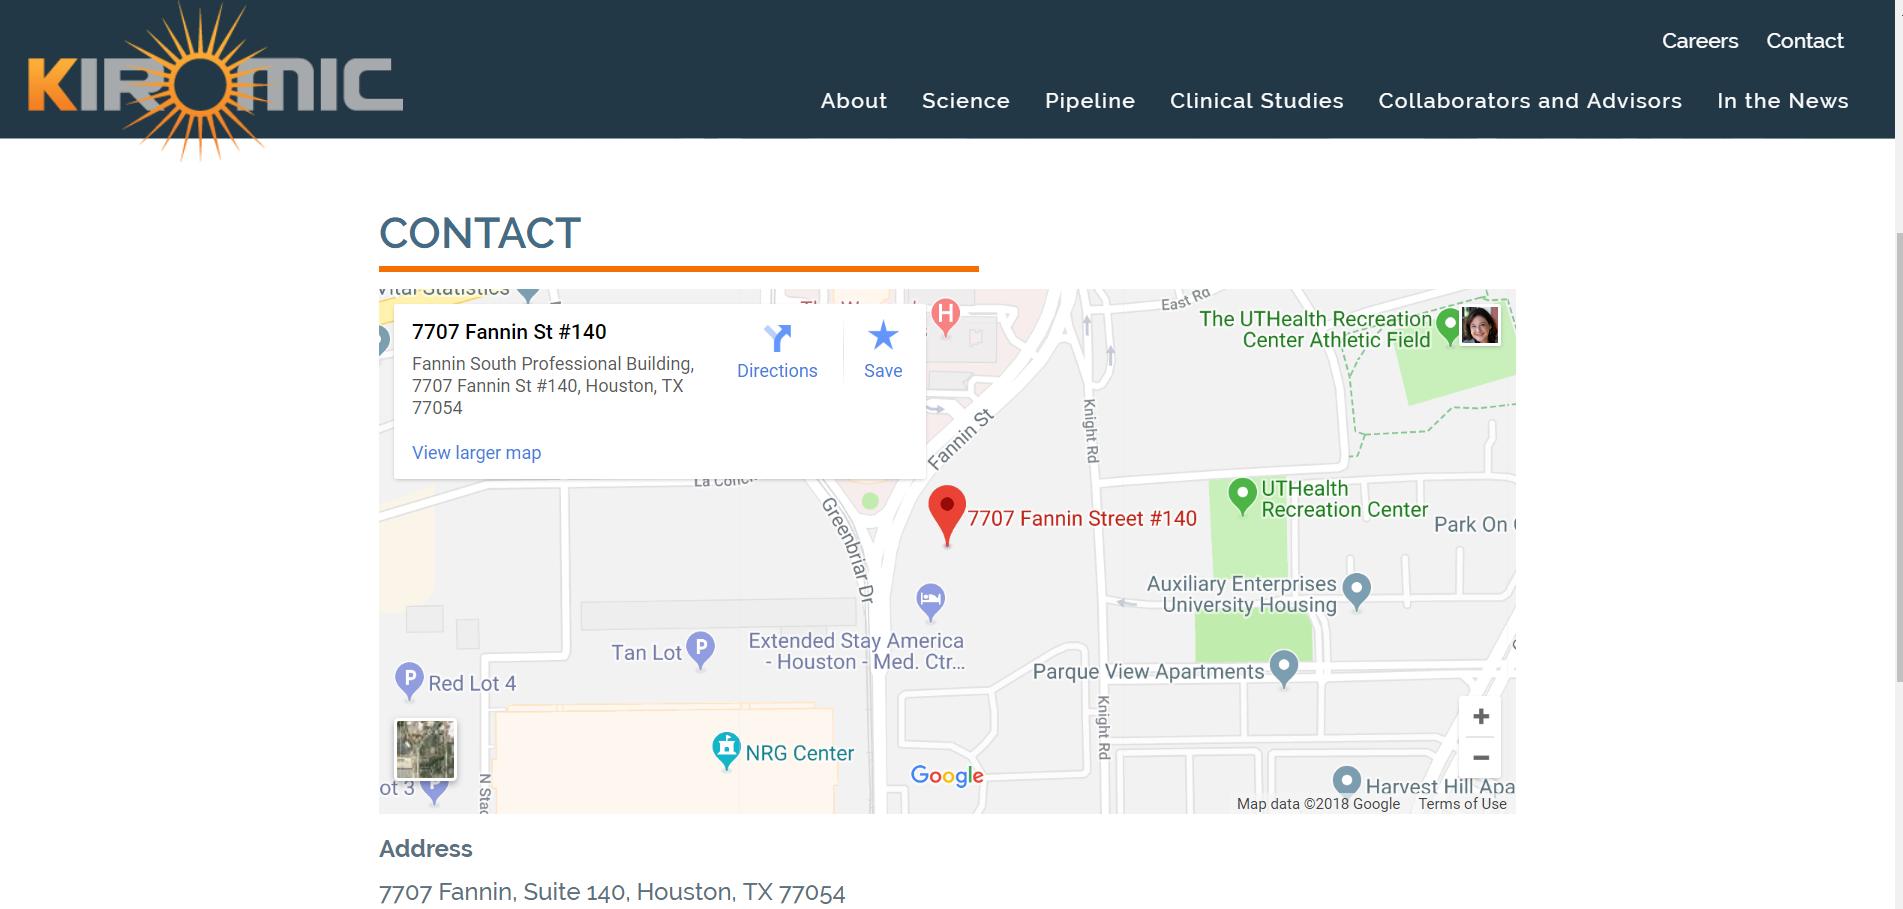 Houston Bioscience Company Considering Move to San Antonio